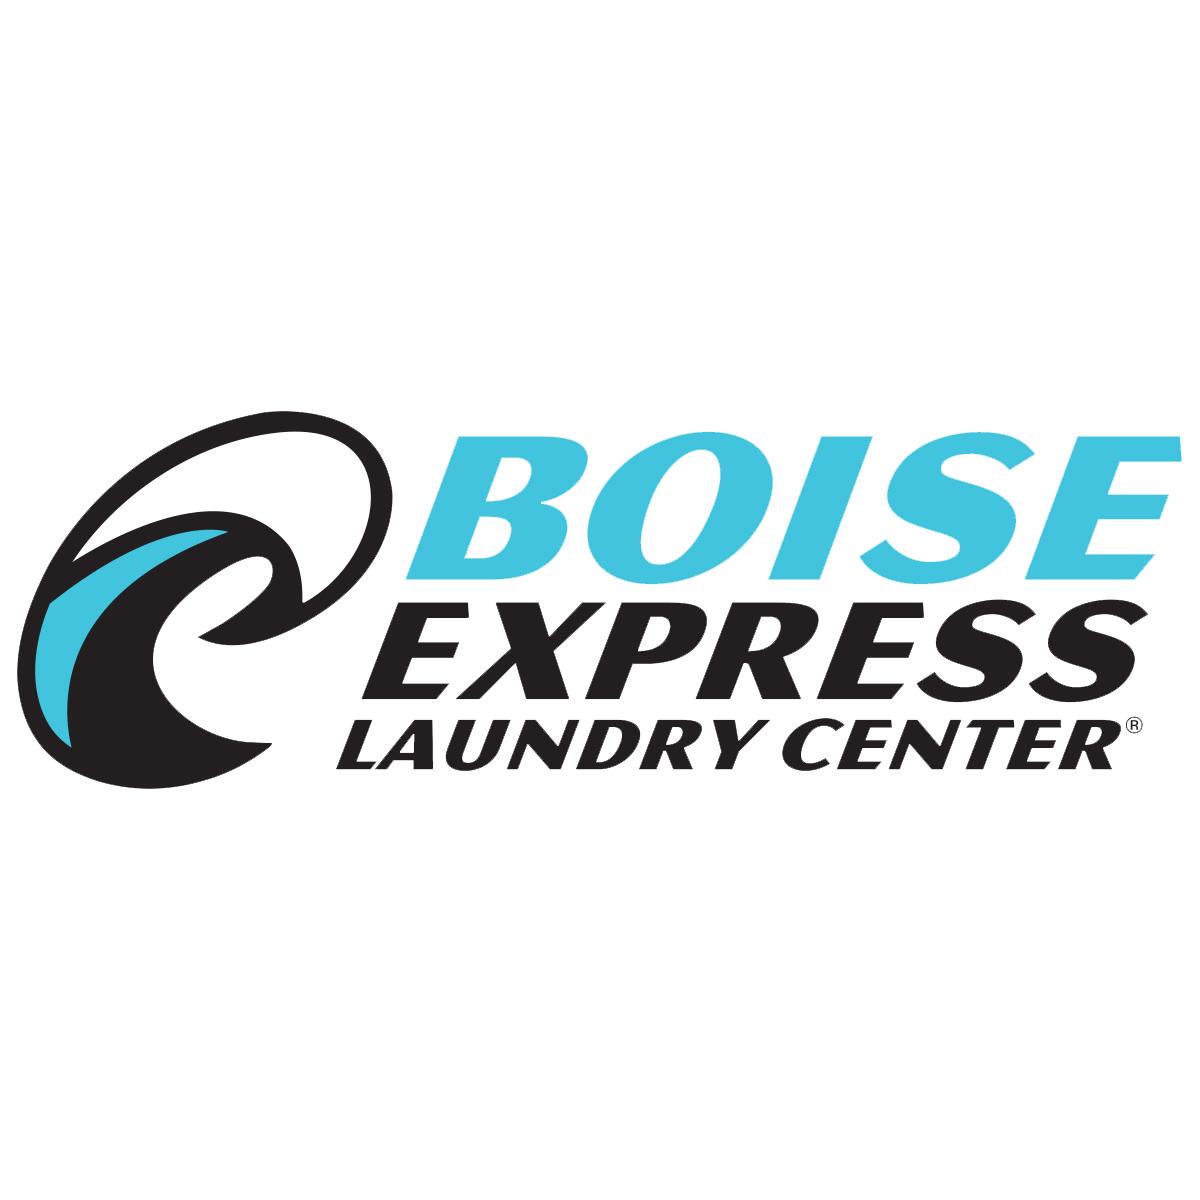 Boise Express Laundry Center